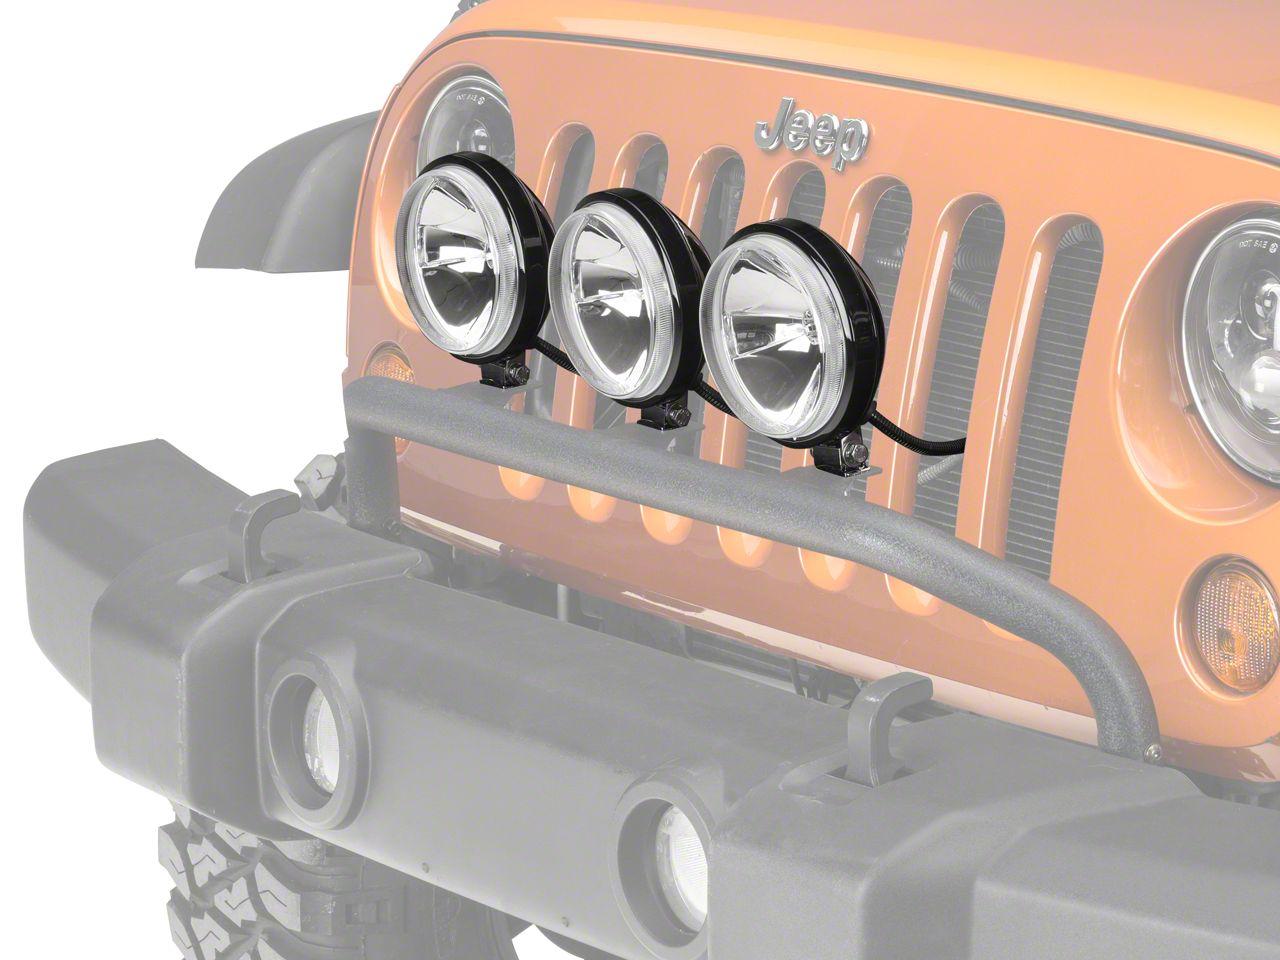 Jeep Fog Lights Wiring Diagram : Jeep fog light wiring diagram jeep wrangler fog light wiring